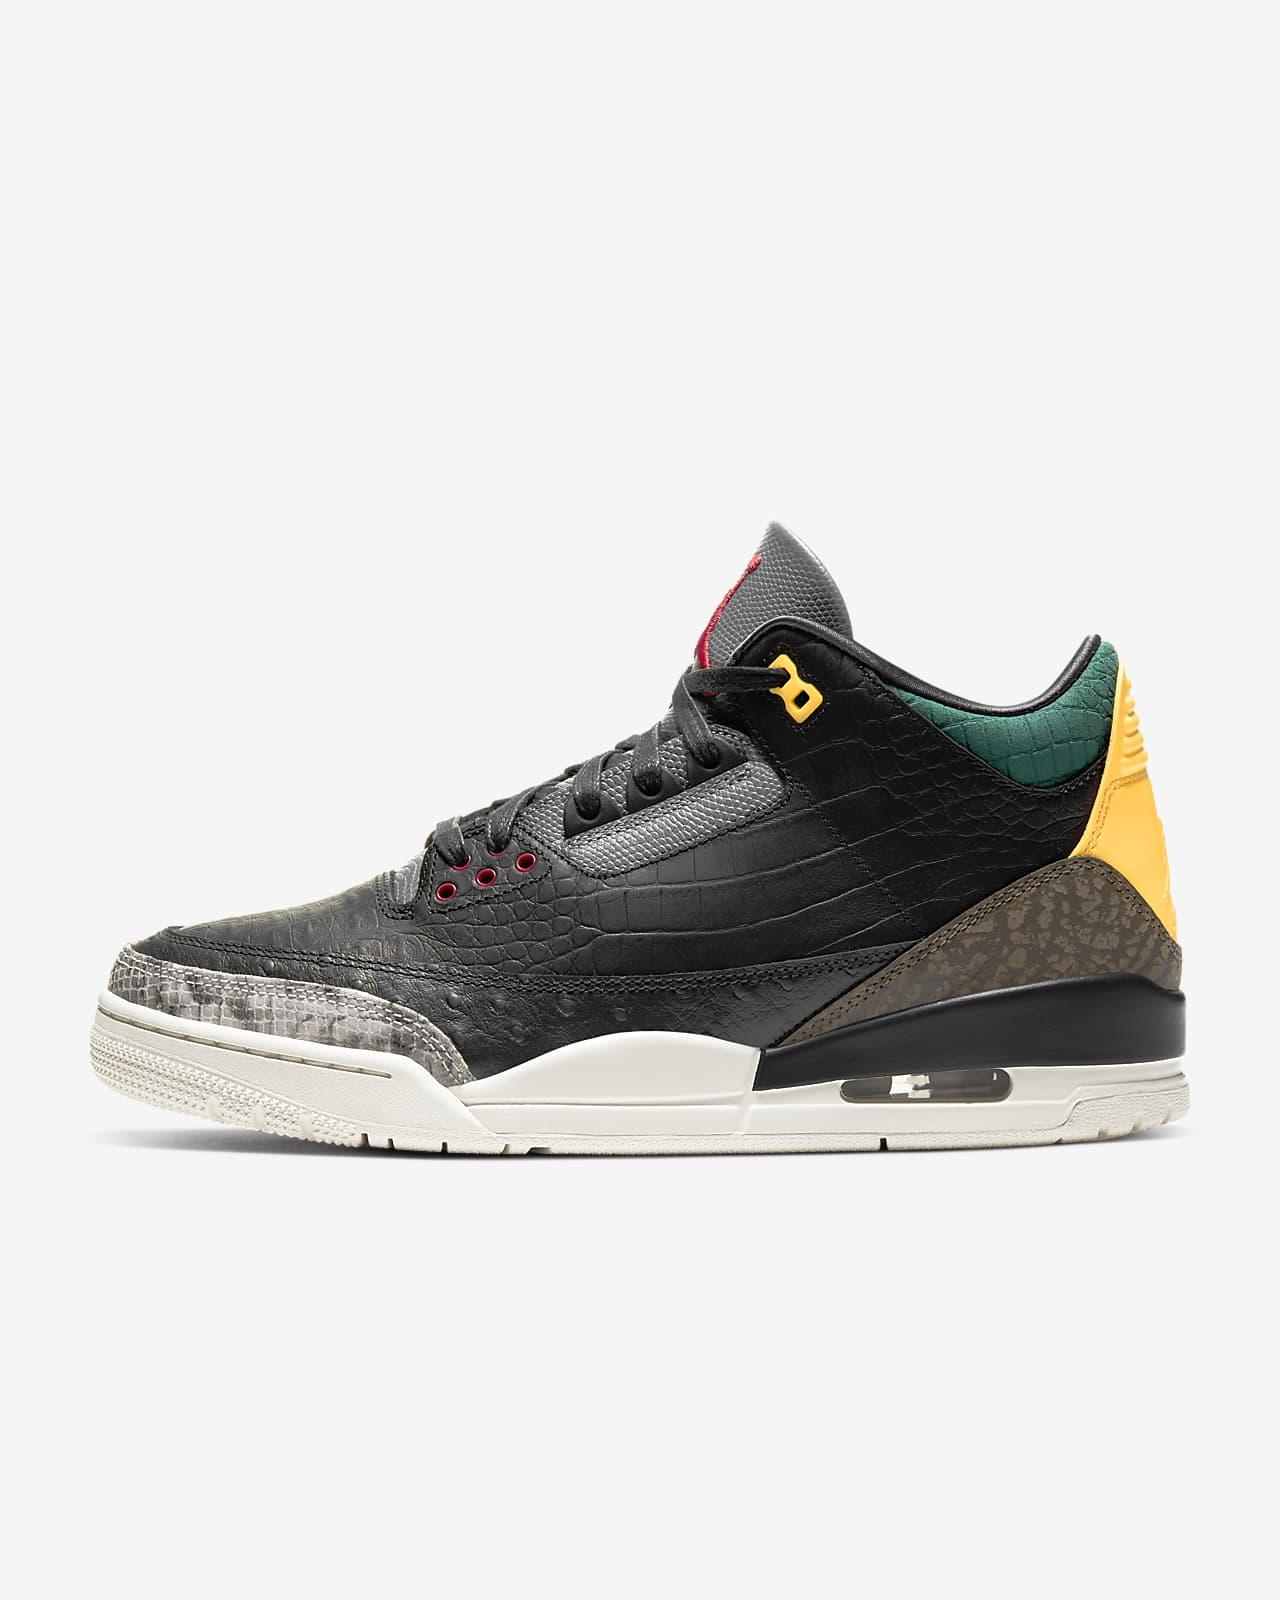 Air Jordan 3 Retro SE 鞋款